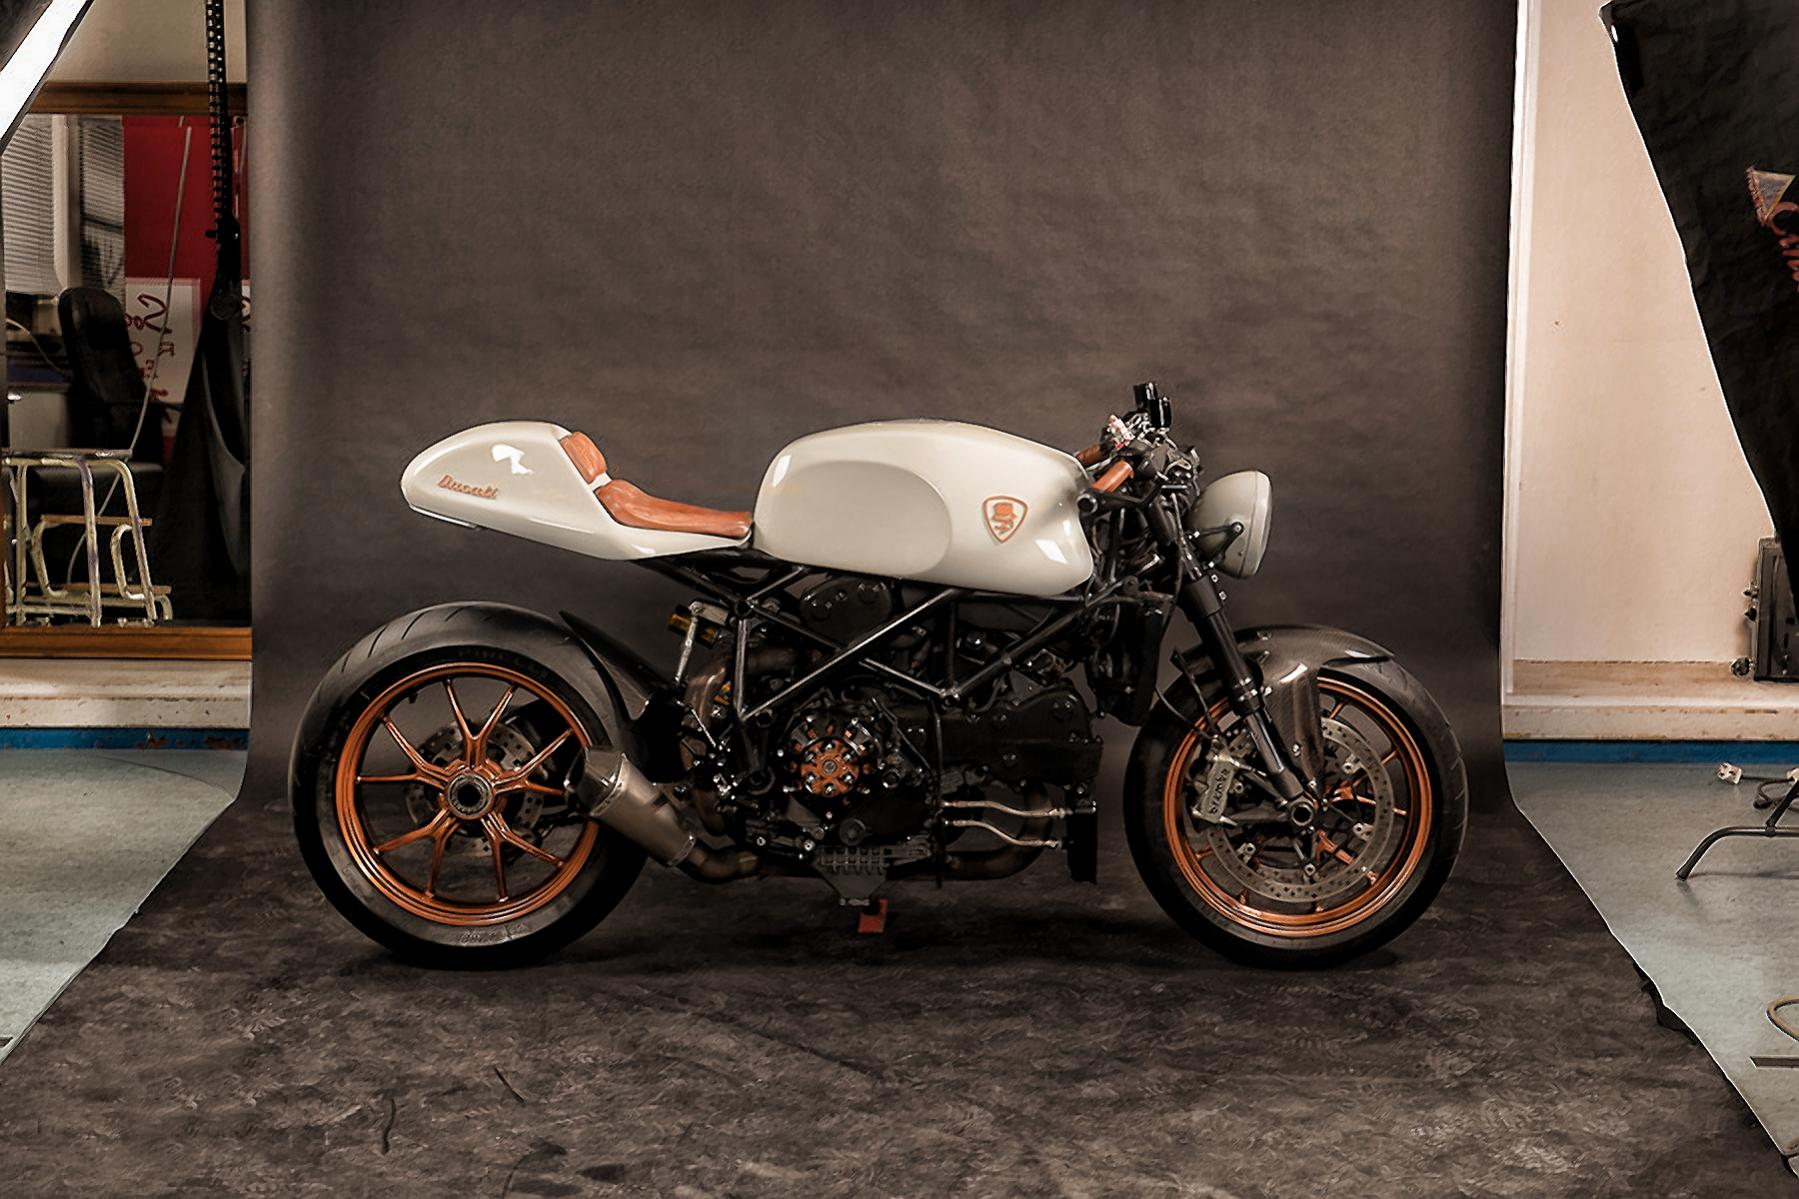 1098 Cafe Racer / Tiger Rocket Valentine - Ducati.ms - The Ultimate Ducati Forum